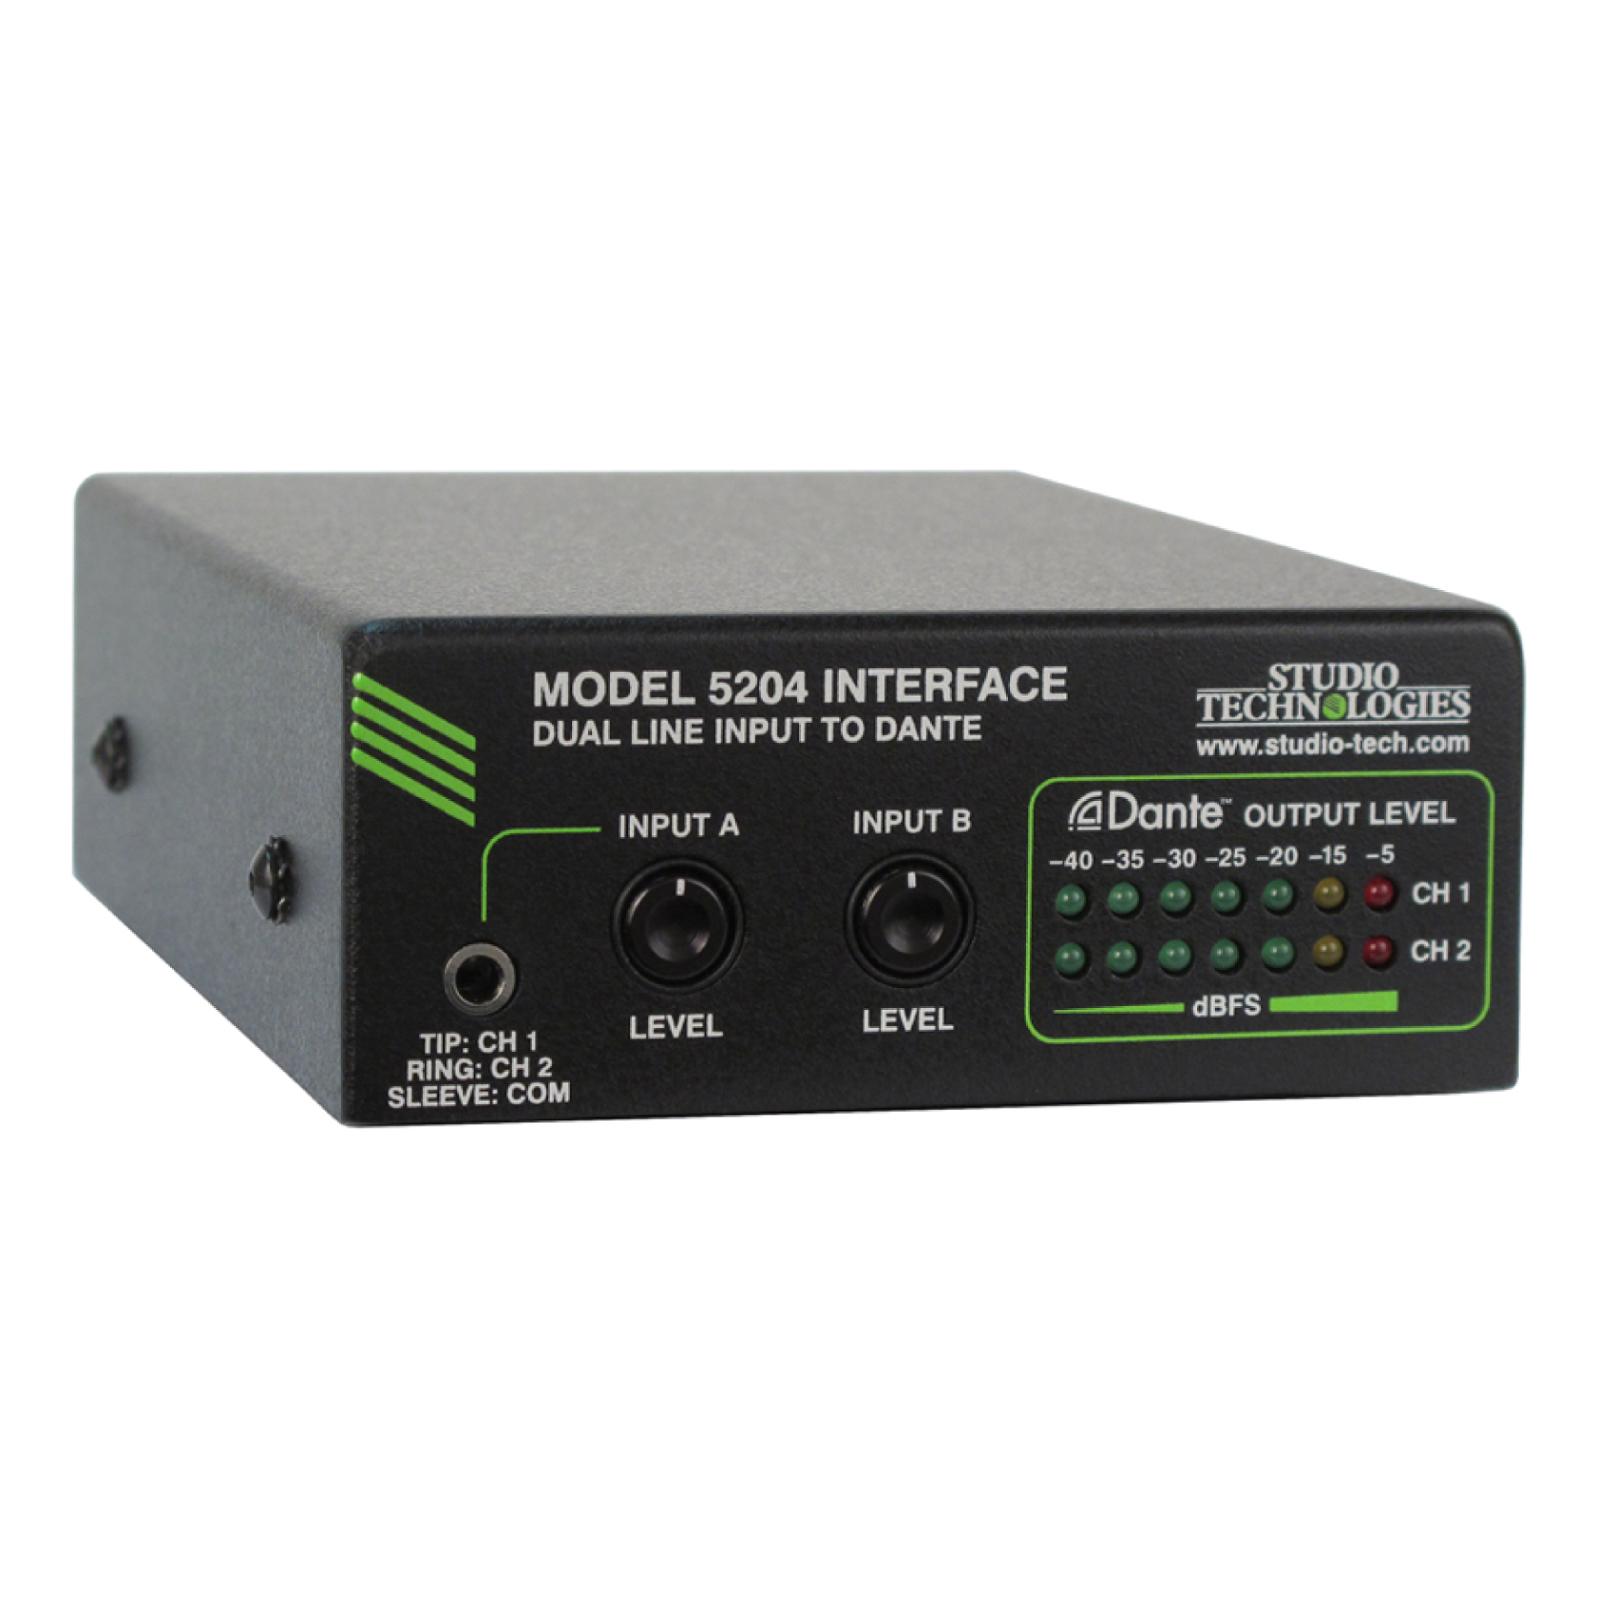 Studio Technologies デュアルライン入力搭載 Danteインターフェイス Model 5204